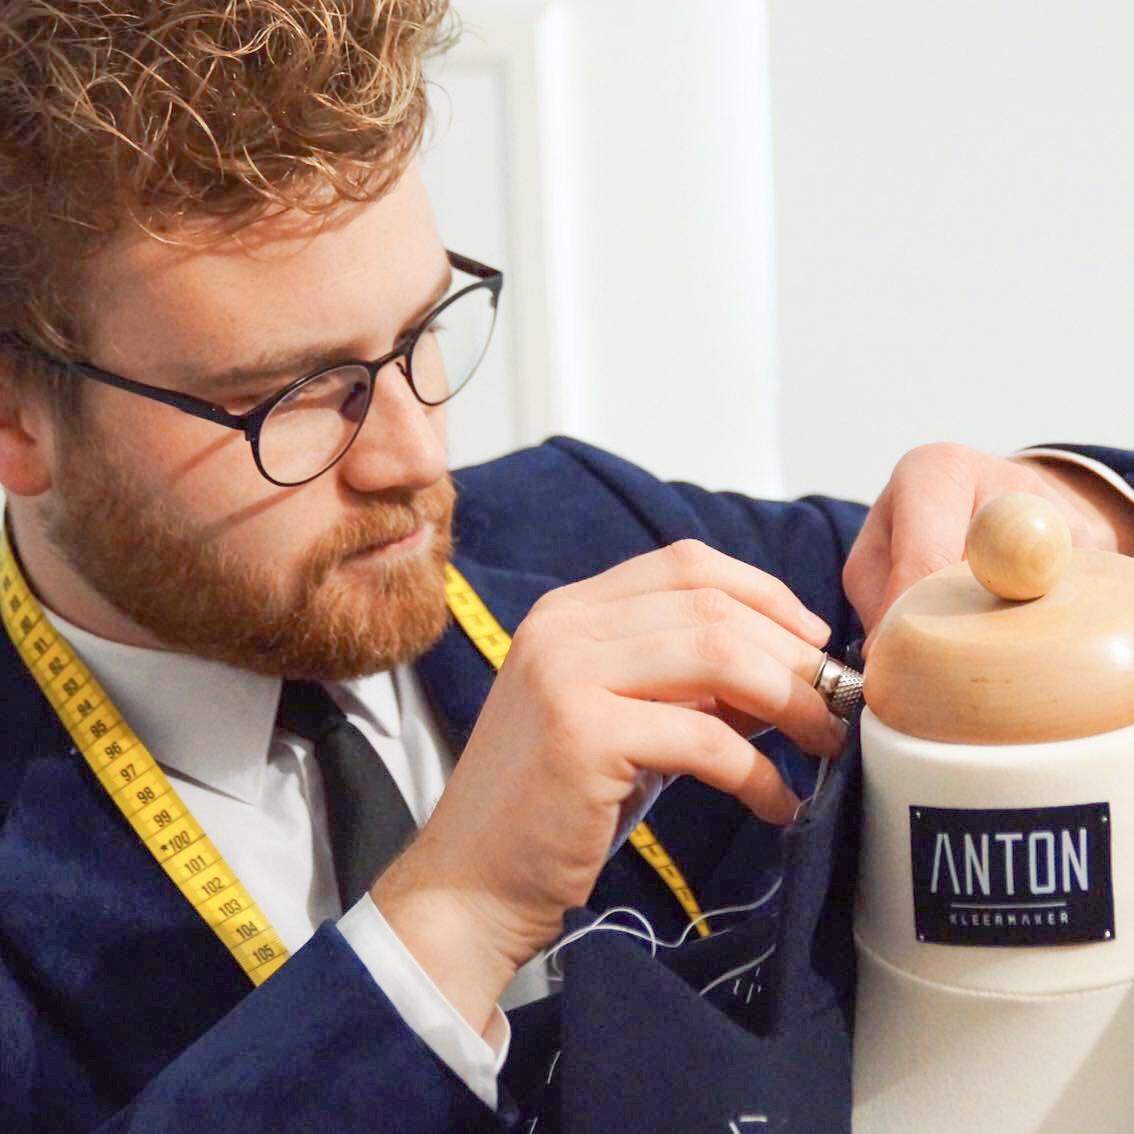 Anton Noordink